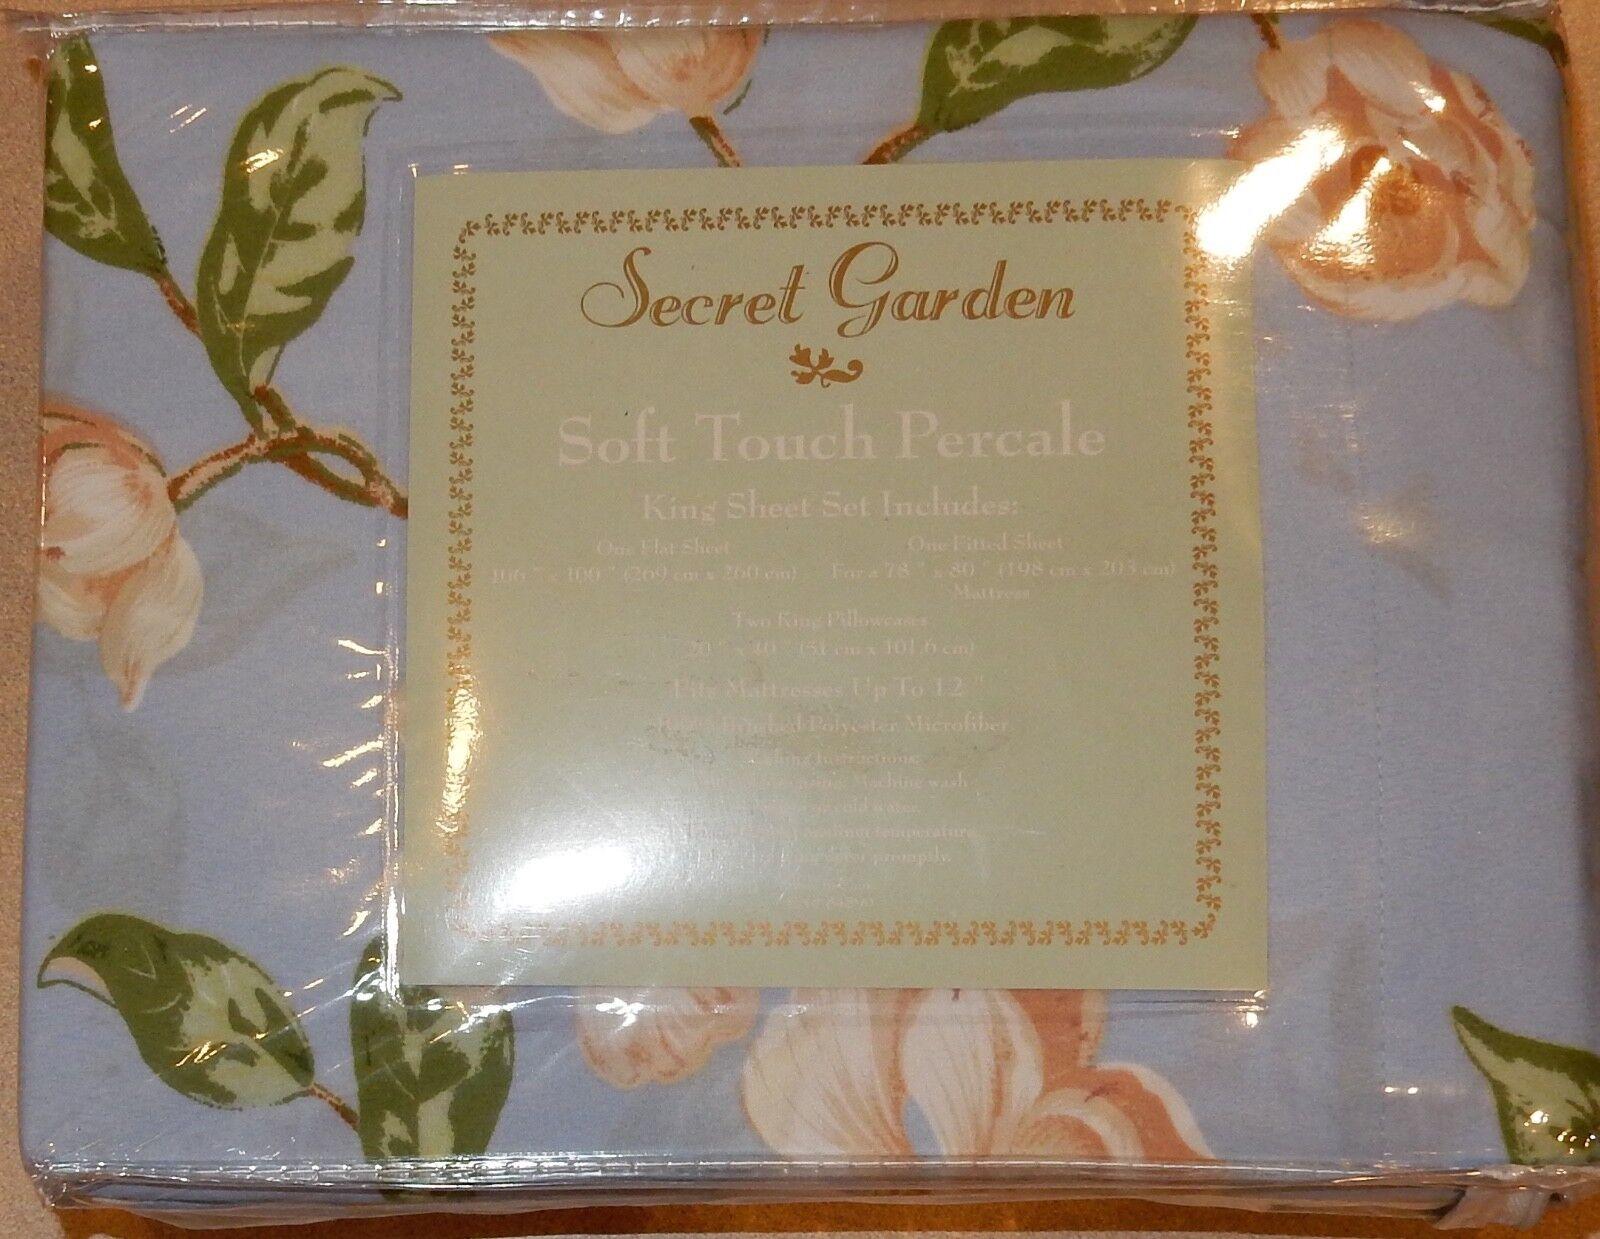 Secret Garden Soft Touch Percale Sheet Set King Größe New Floral